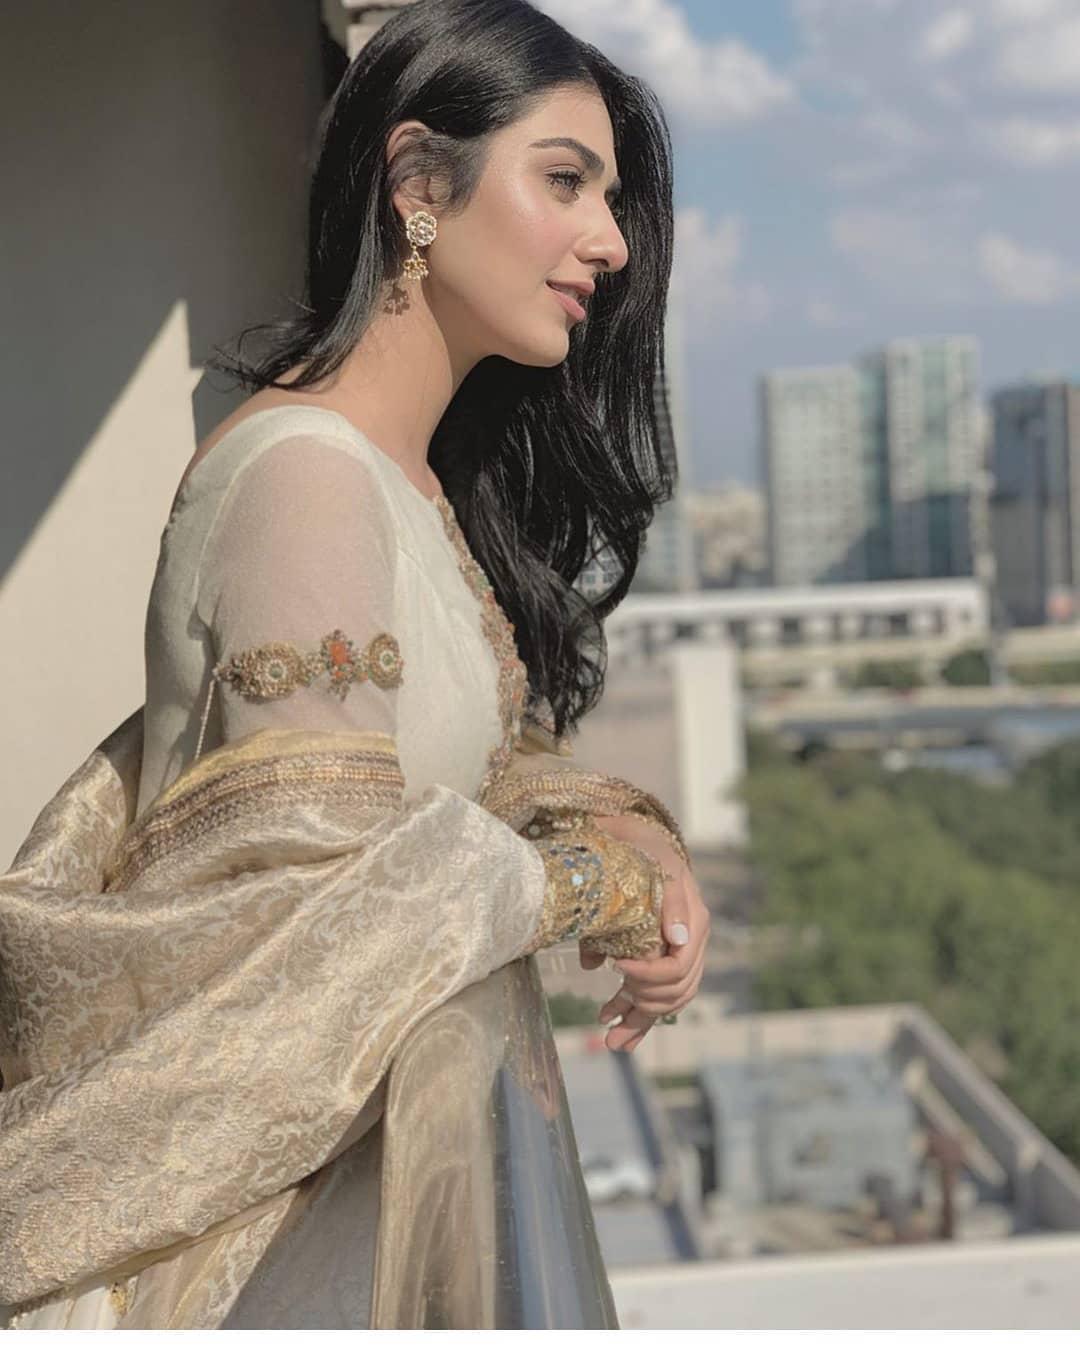 Pakistani Model Sarah Khan Photoshoot (11)